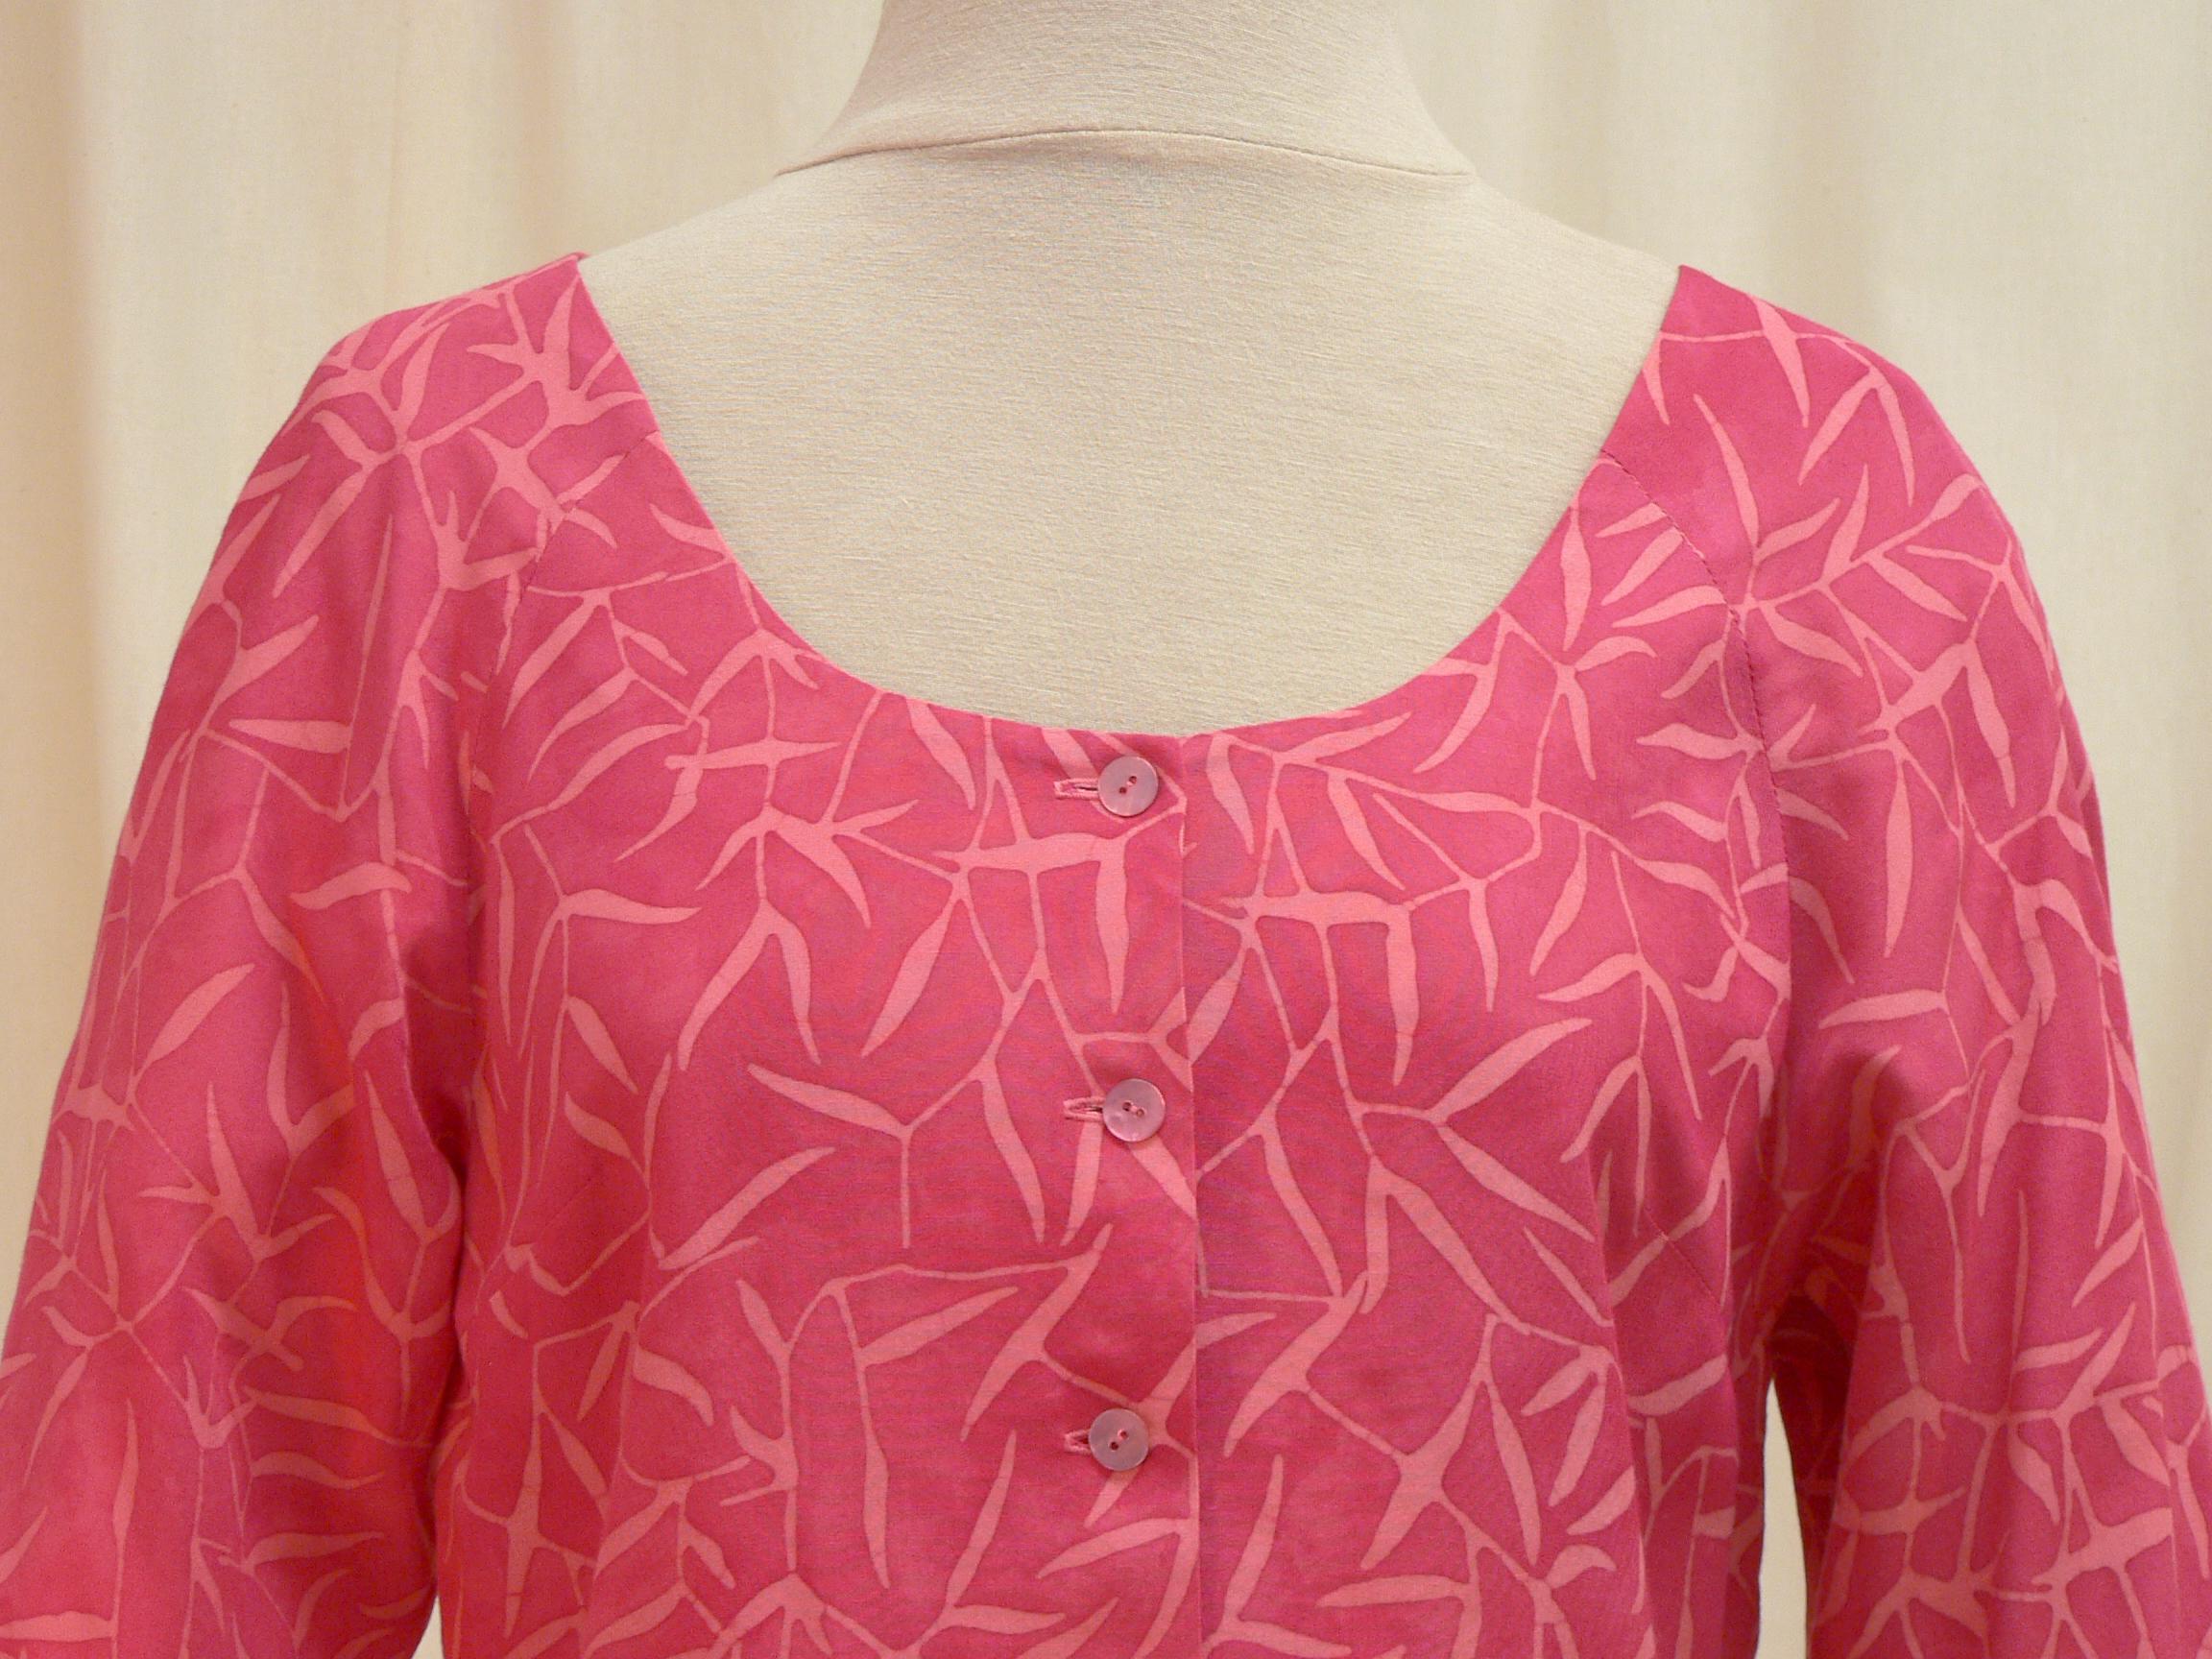 blouse06_front_detail.jpg